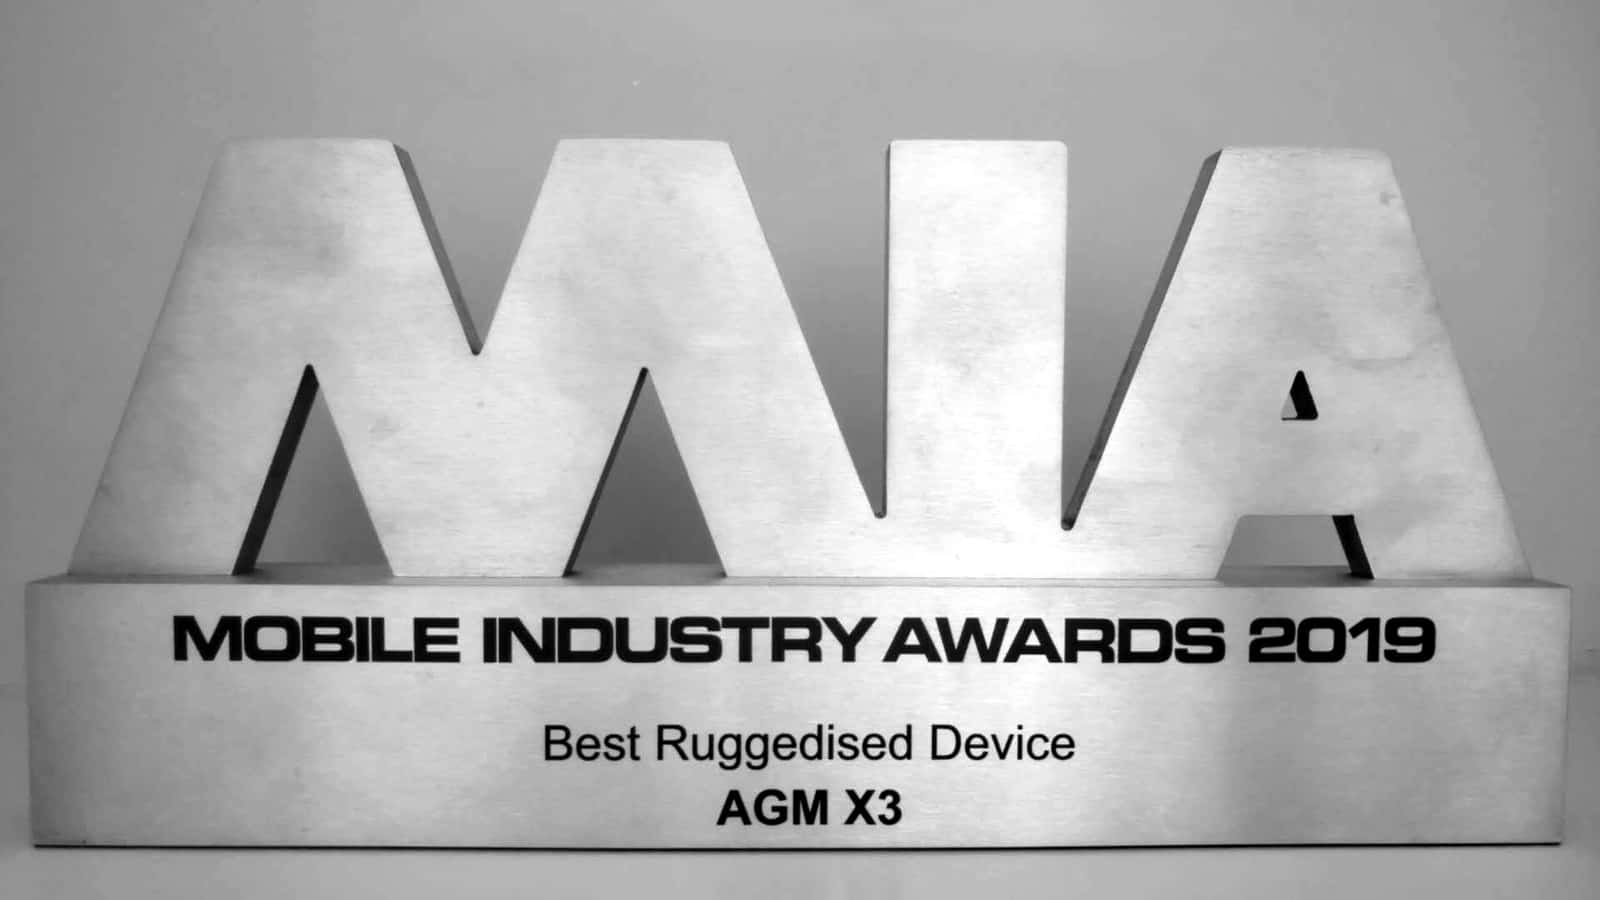 AGM X3 award